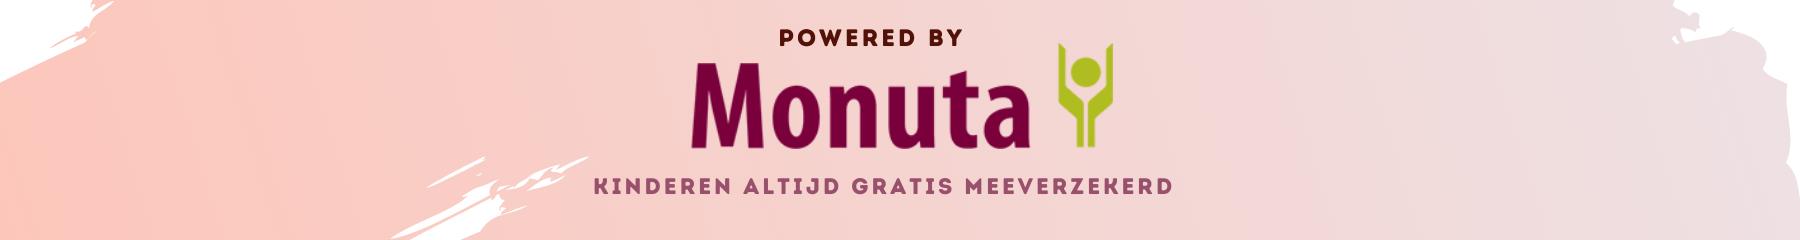 Powered by Monuta